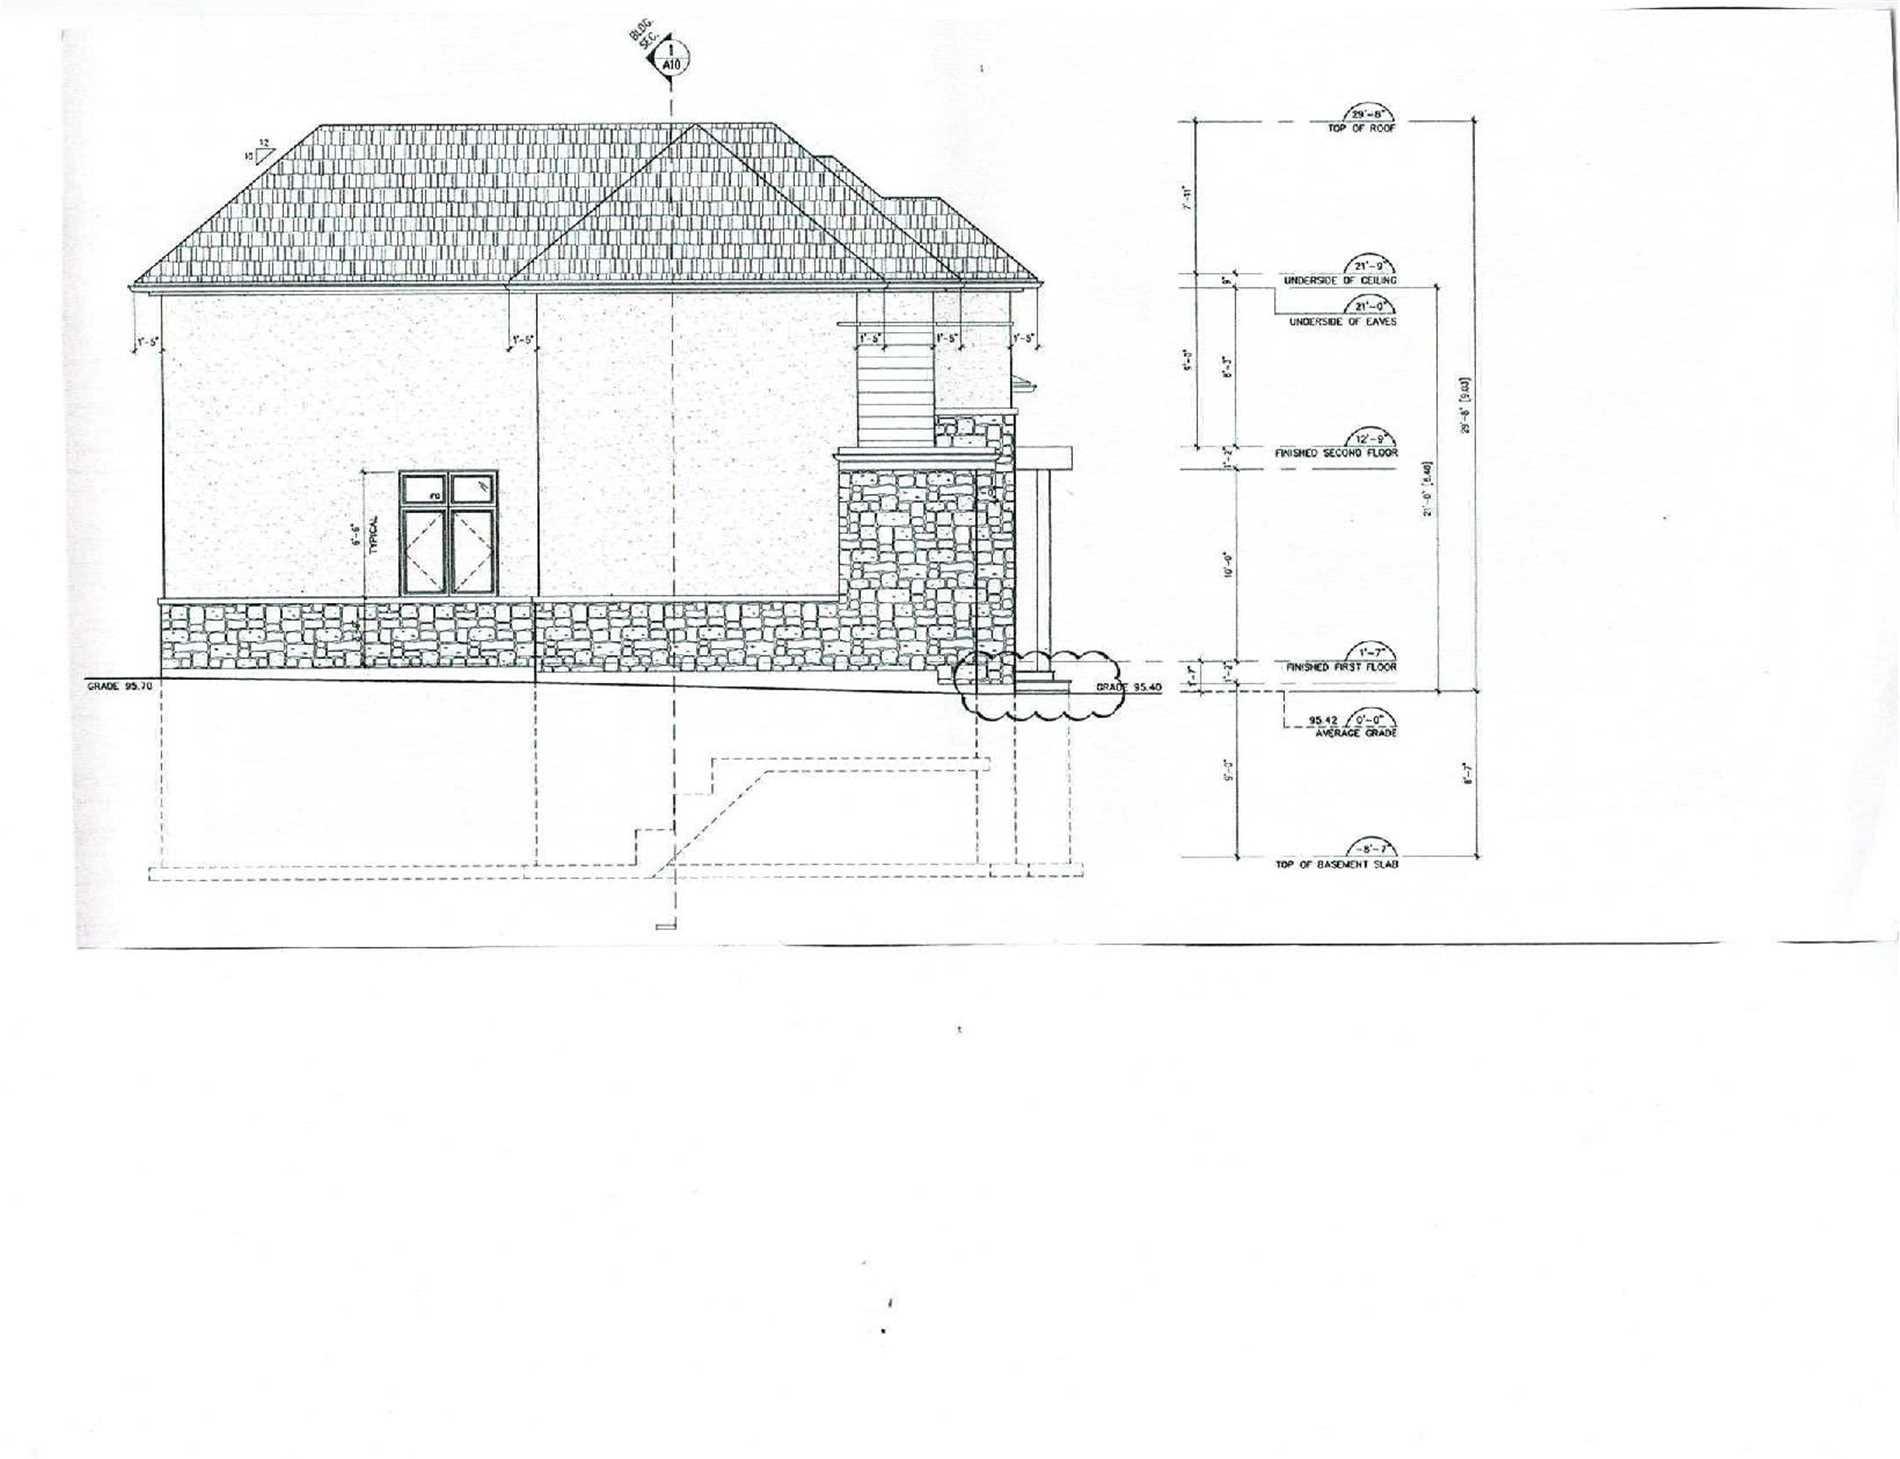 918 Halsham Crt, Mississauga W4616959